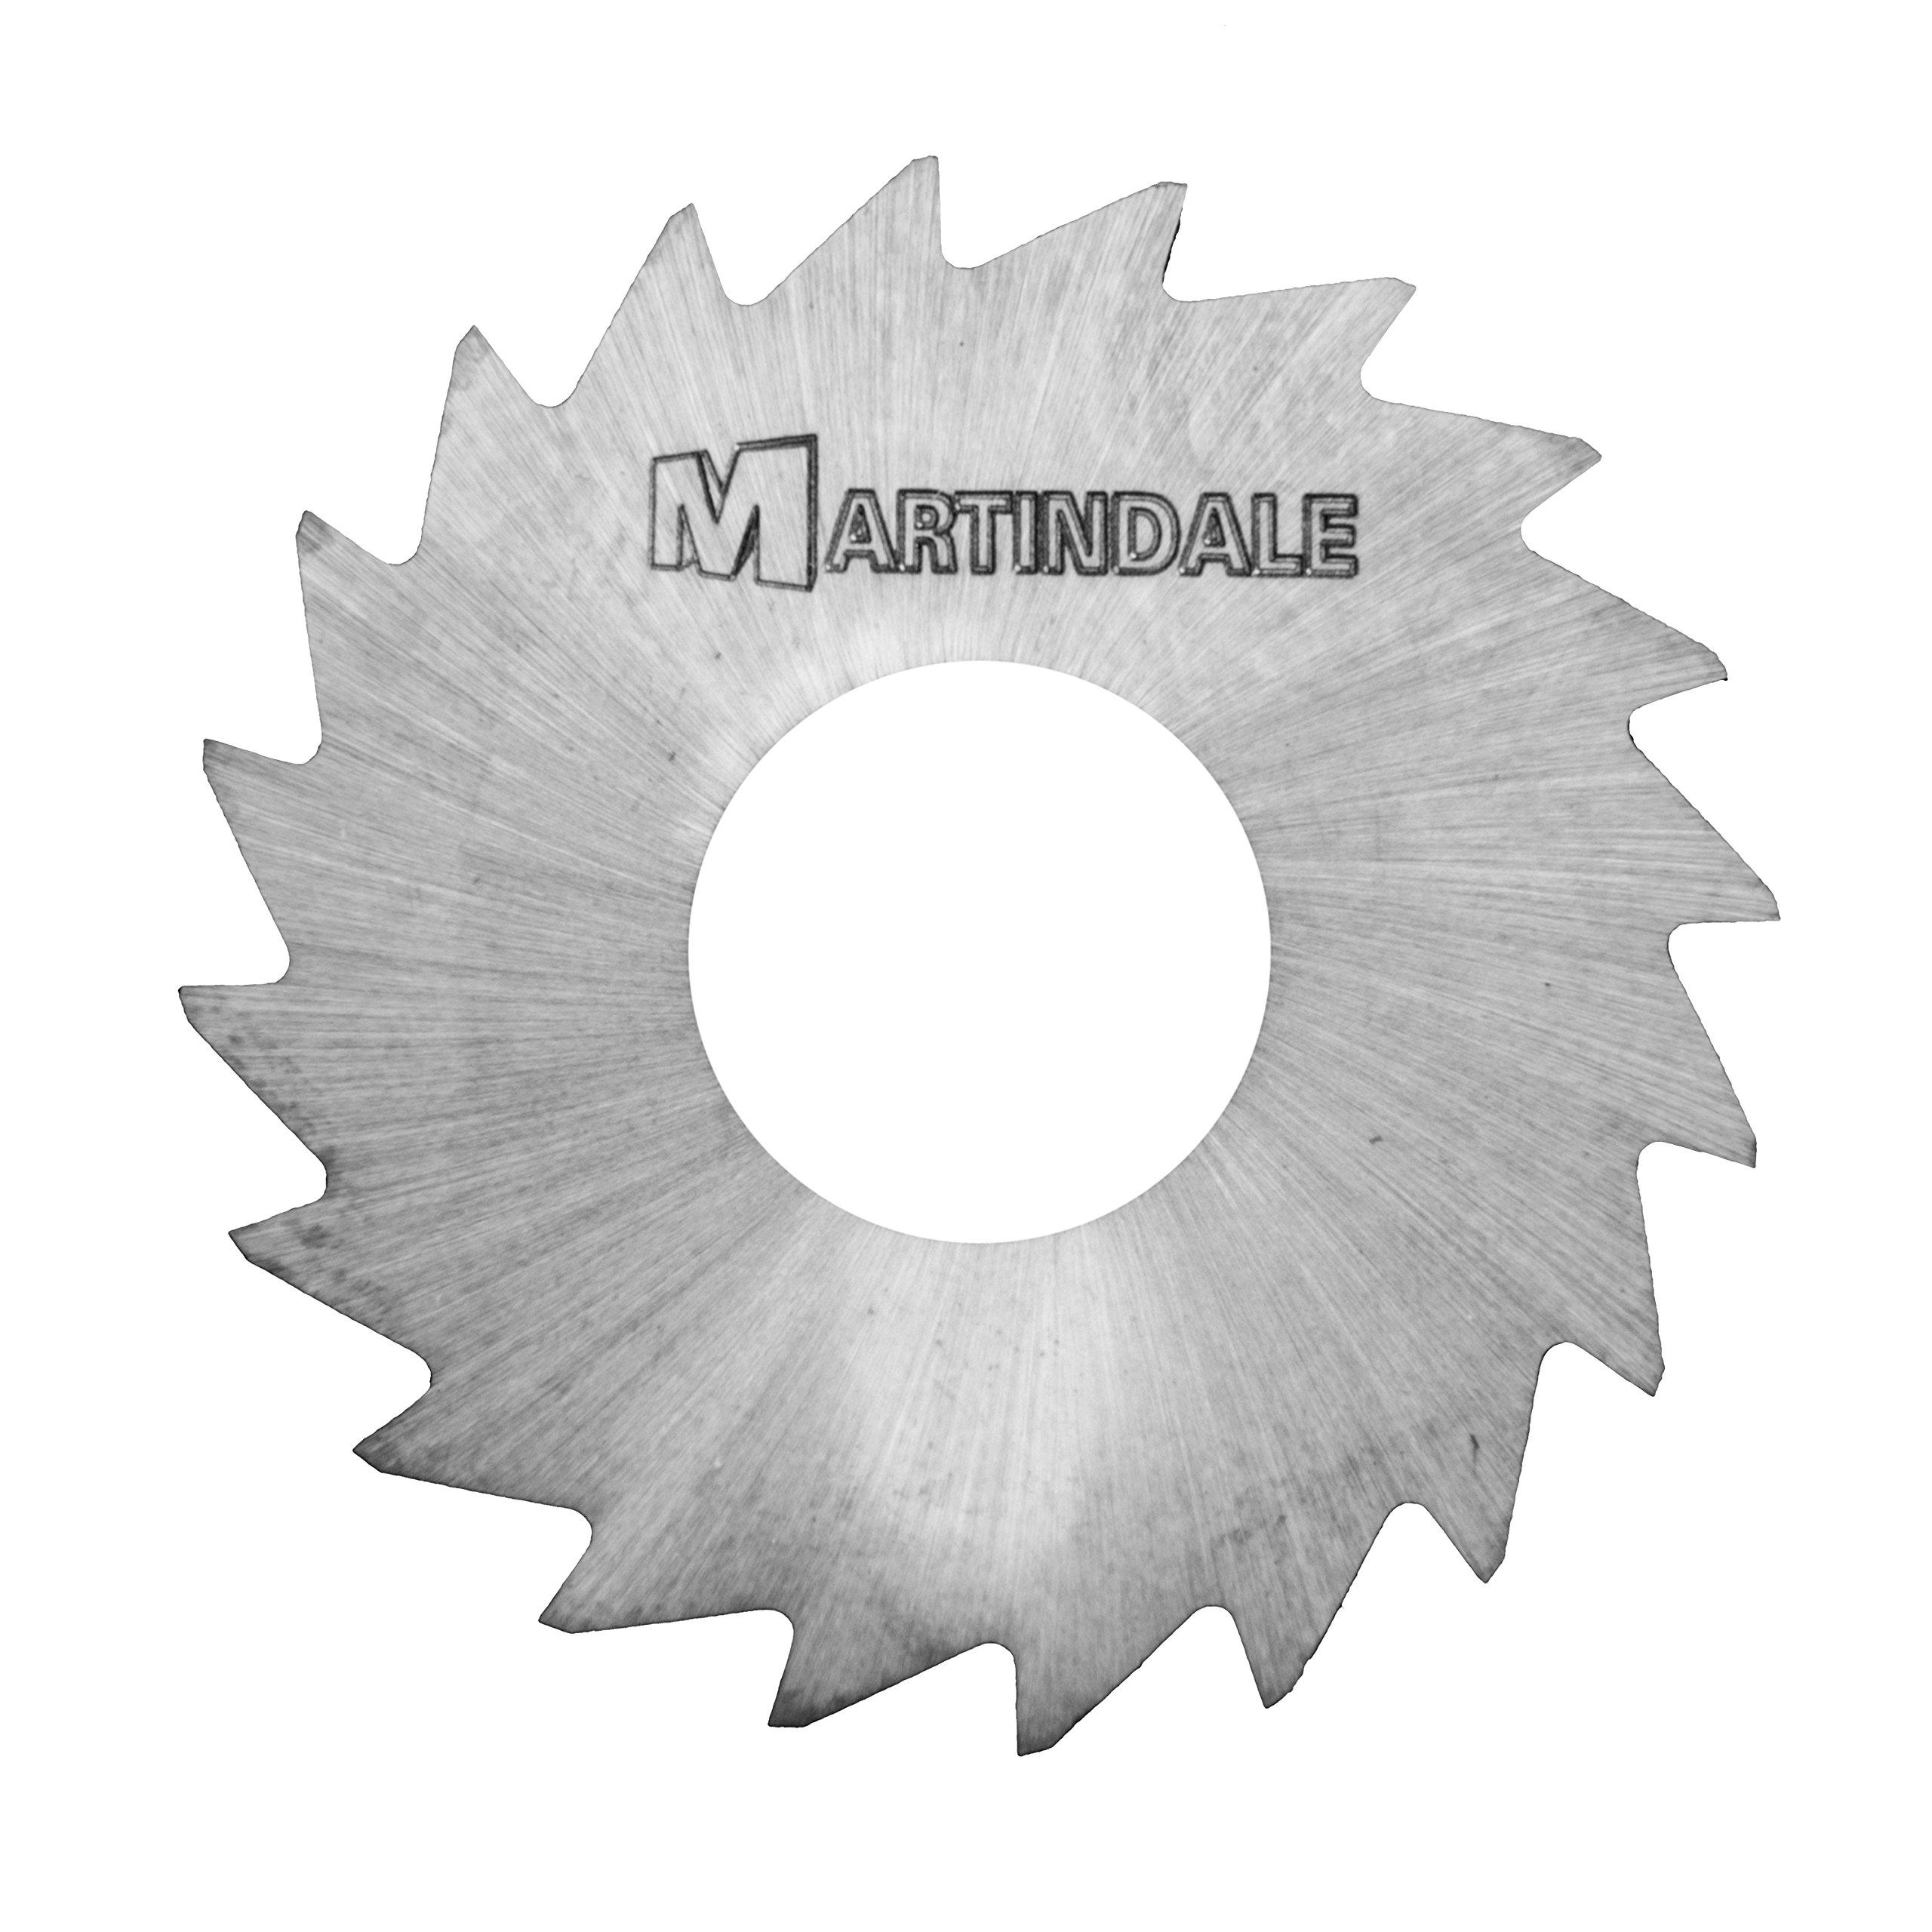 Martindale TUNS108065 Tungsten-Carbide Tungsten-Carbide Saws,  1-1/4'' Outer Diameter,  1/2'' Hole Diameter,  0.065'' Thick,  24 Teeth